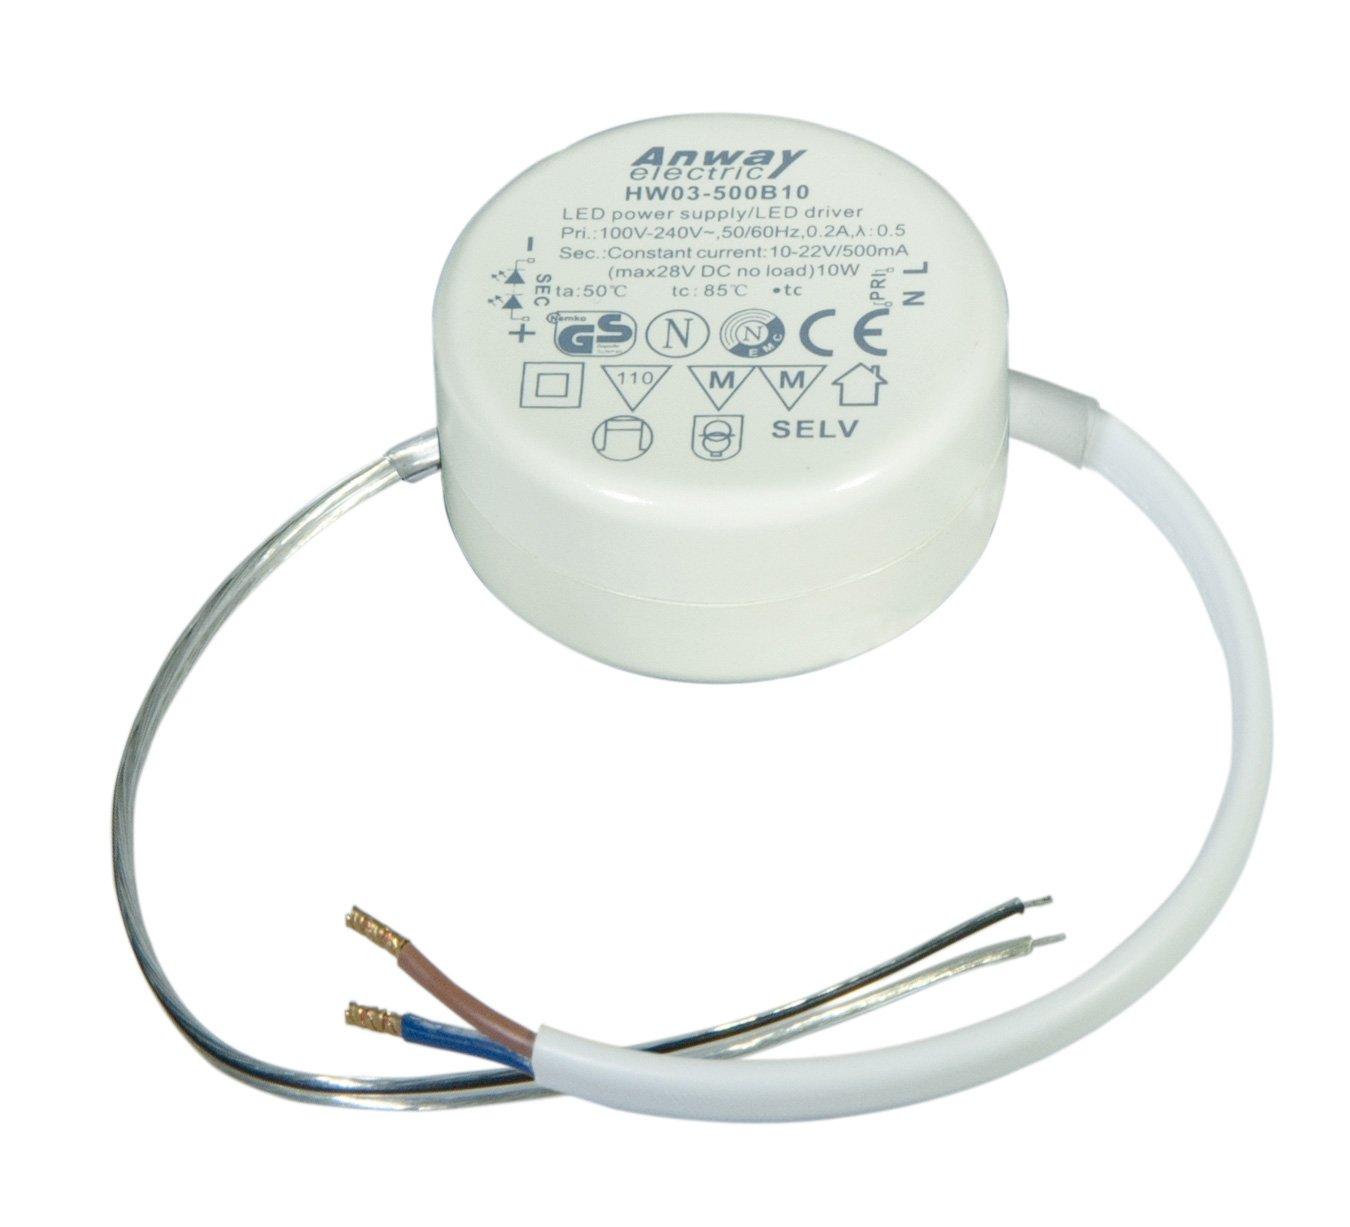 00011731 - ANWAY LED Treiber HW03-500B10 10W/500mA/10-22V